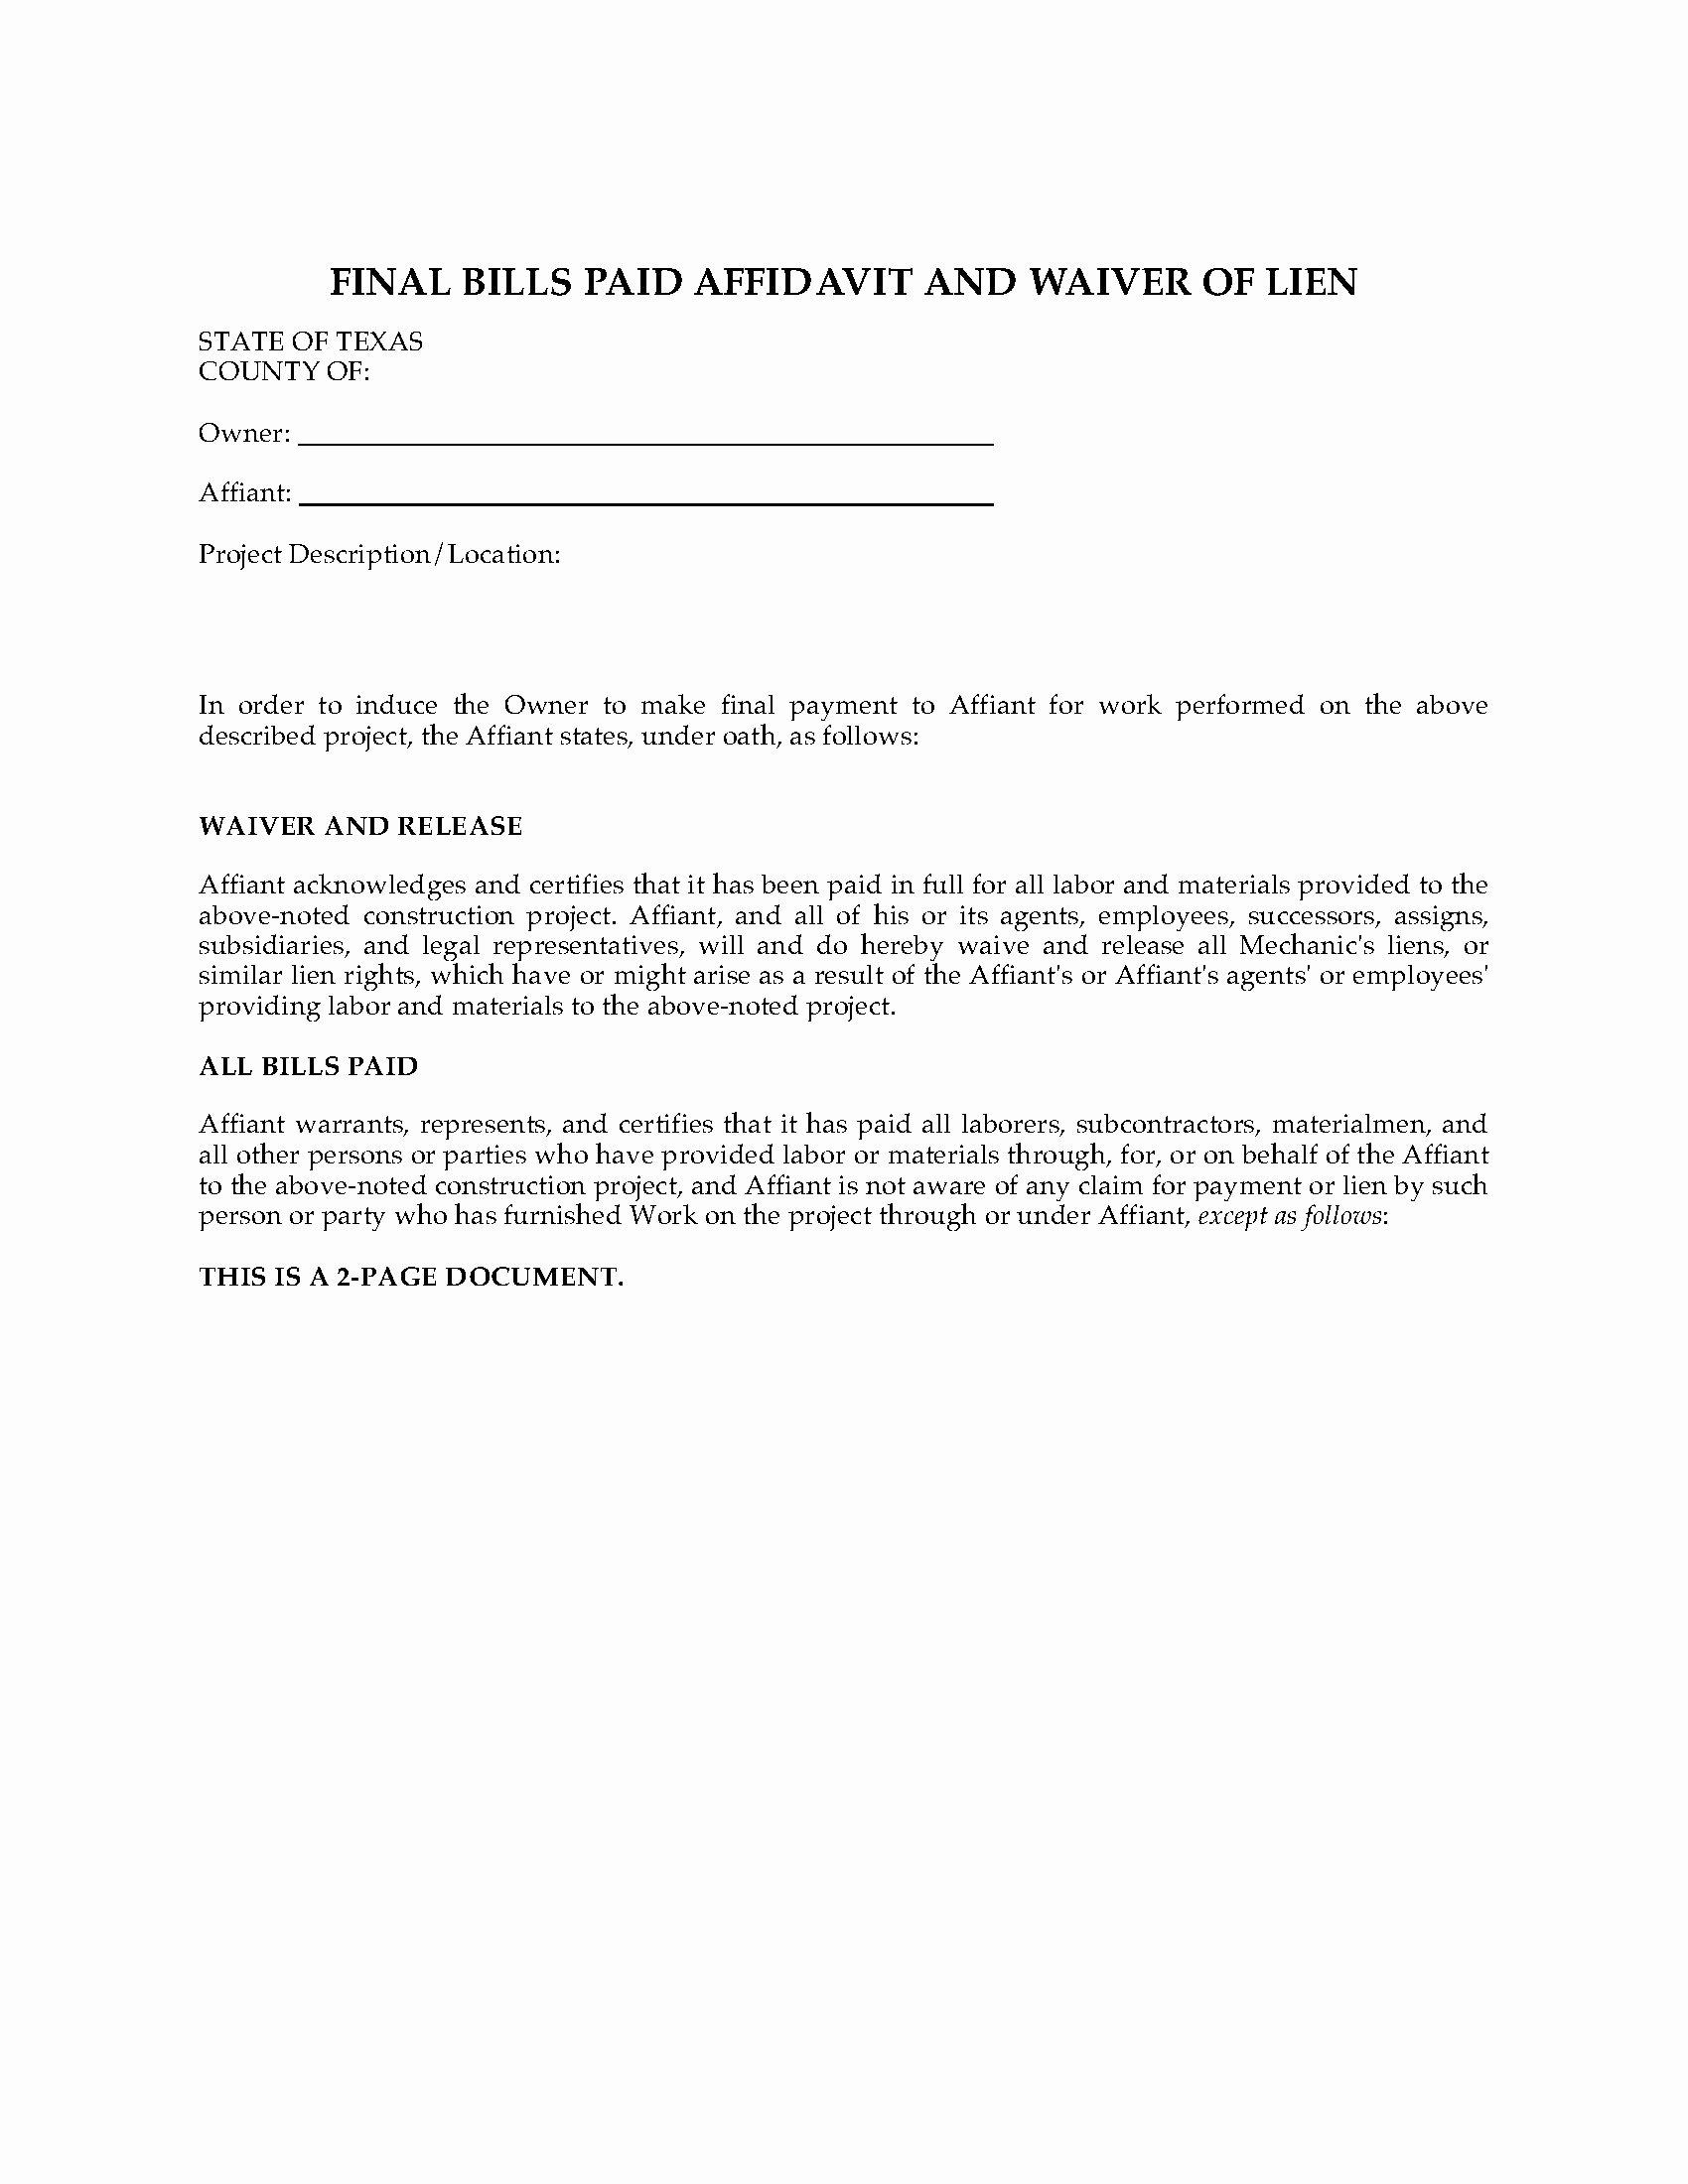 Final Lien Waiver Template Lovely Texas Final Bills Paid Affidavit and Waiver Of Lien